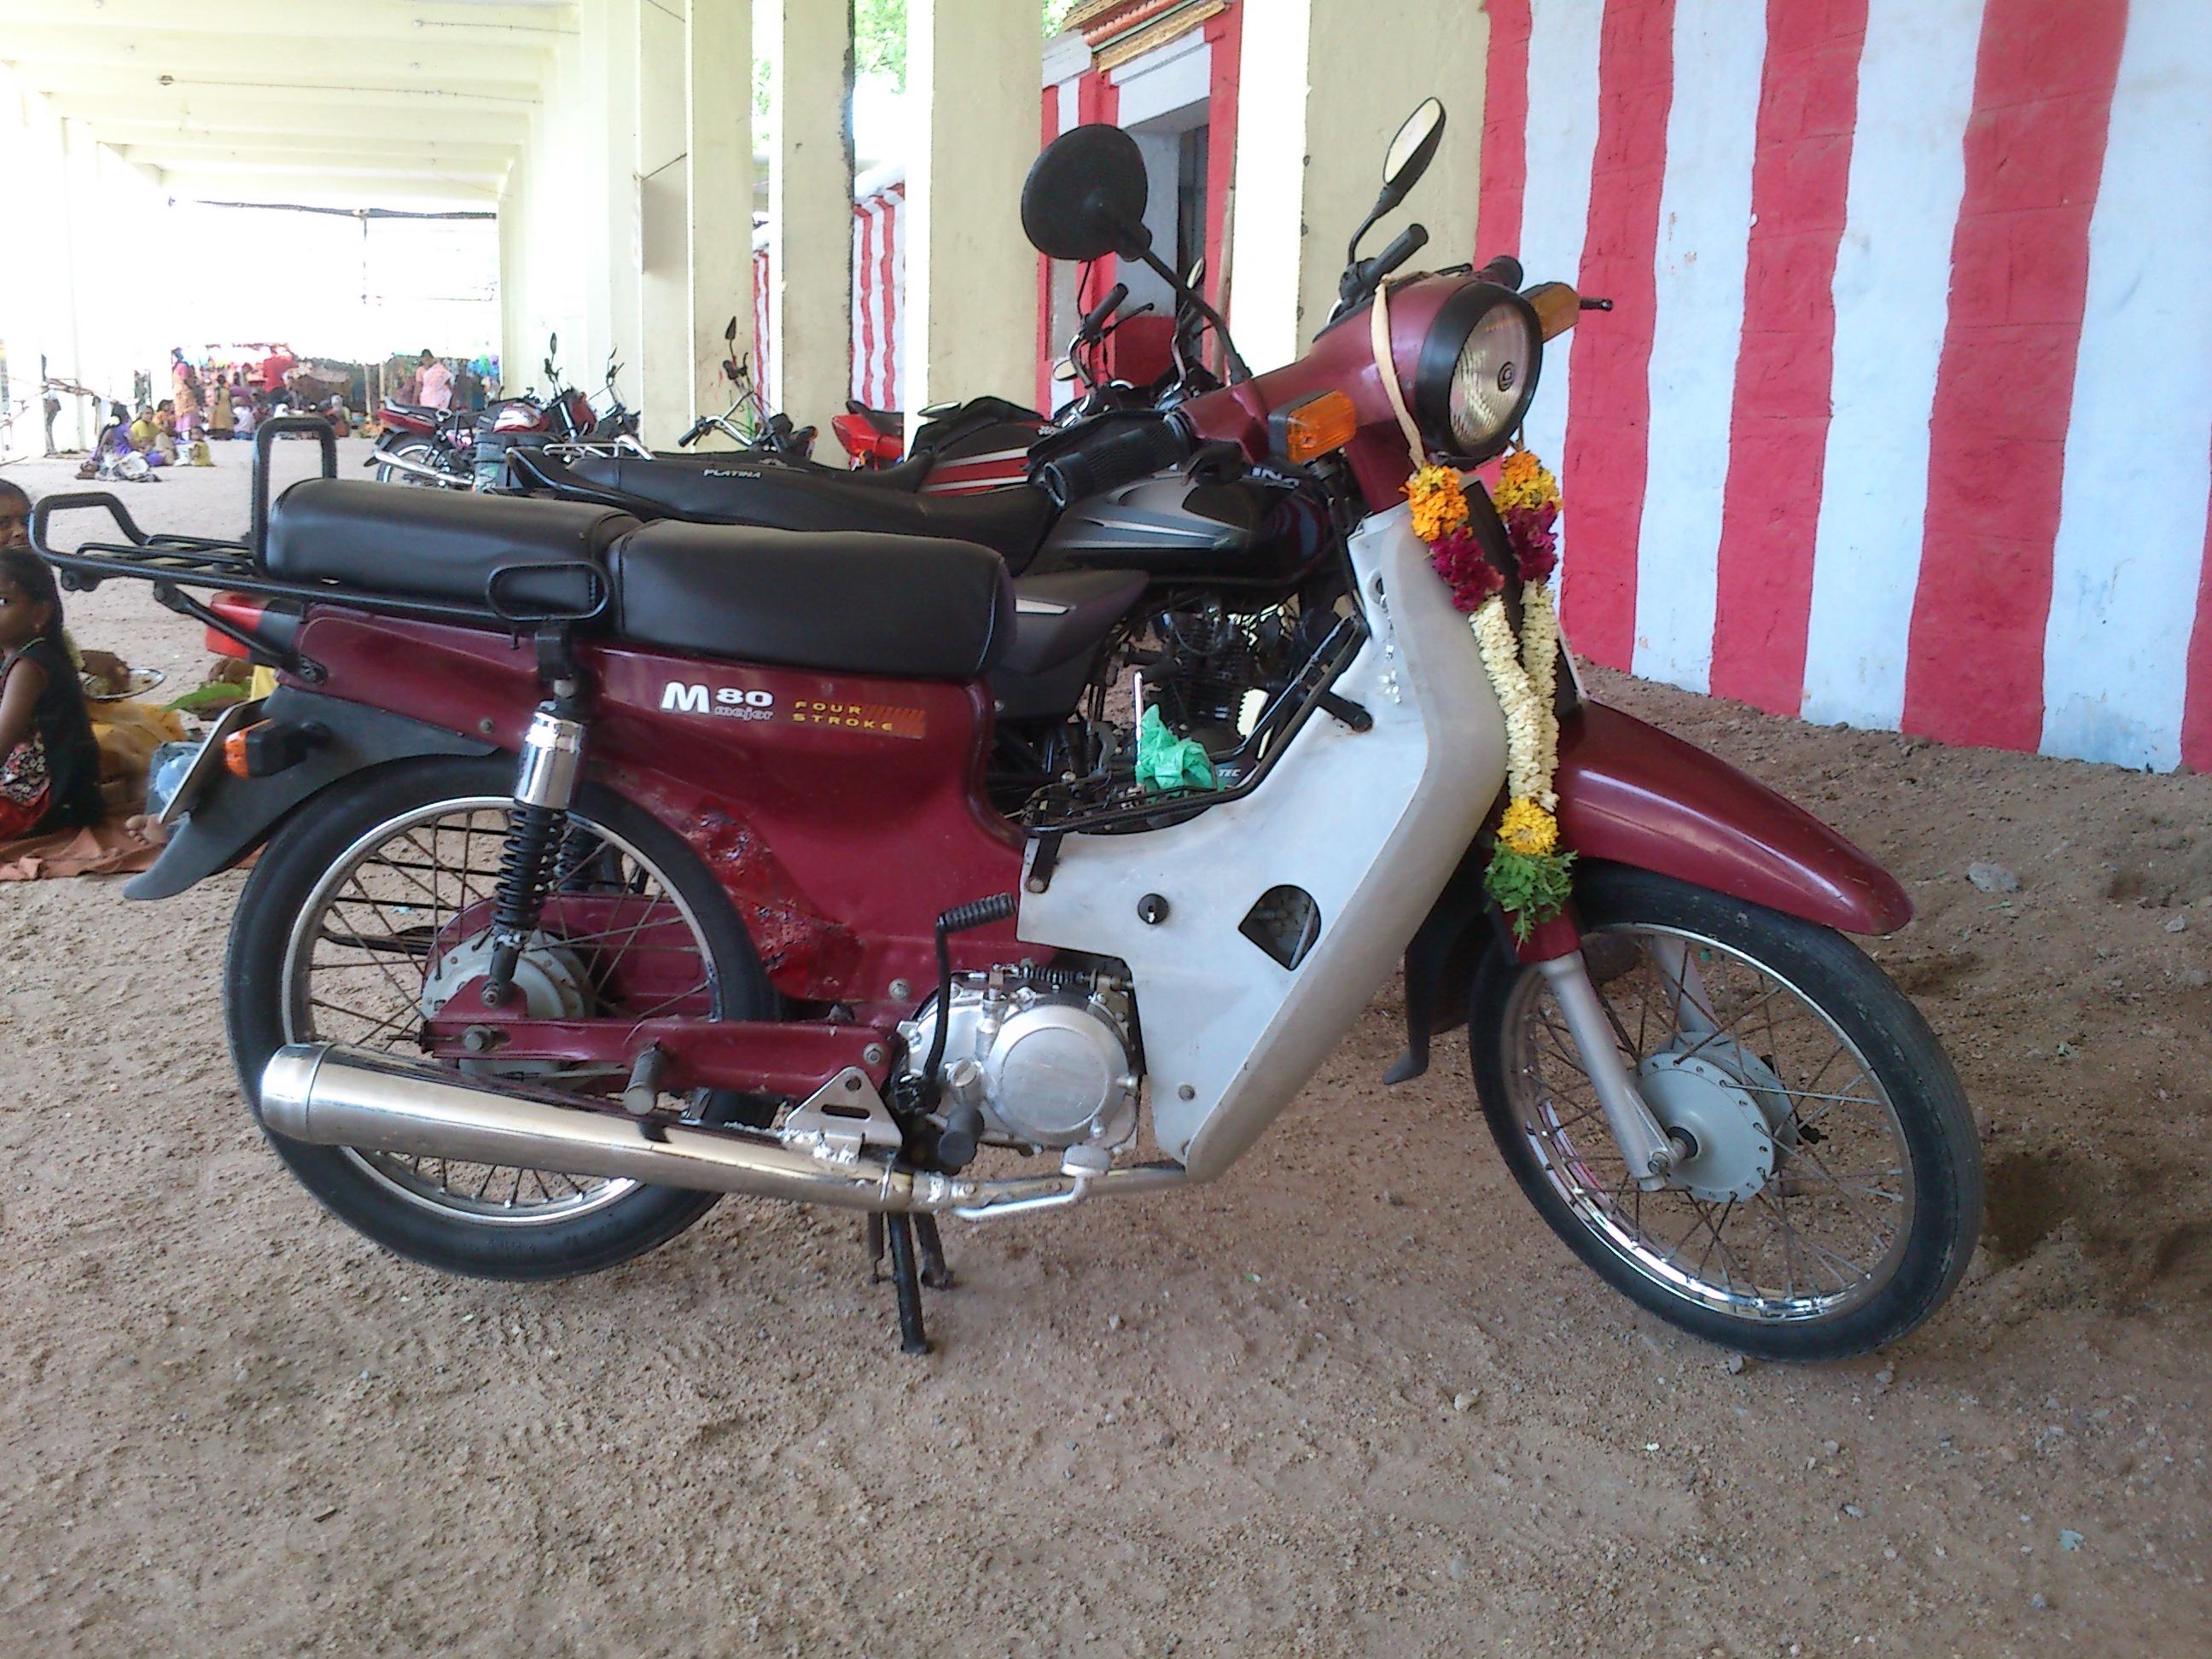 Nice bike . - BAJAJ M80 Customer Review - MouthShut.com